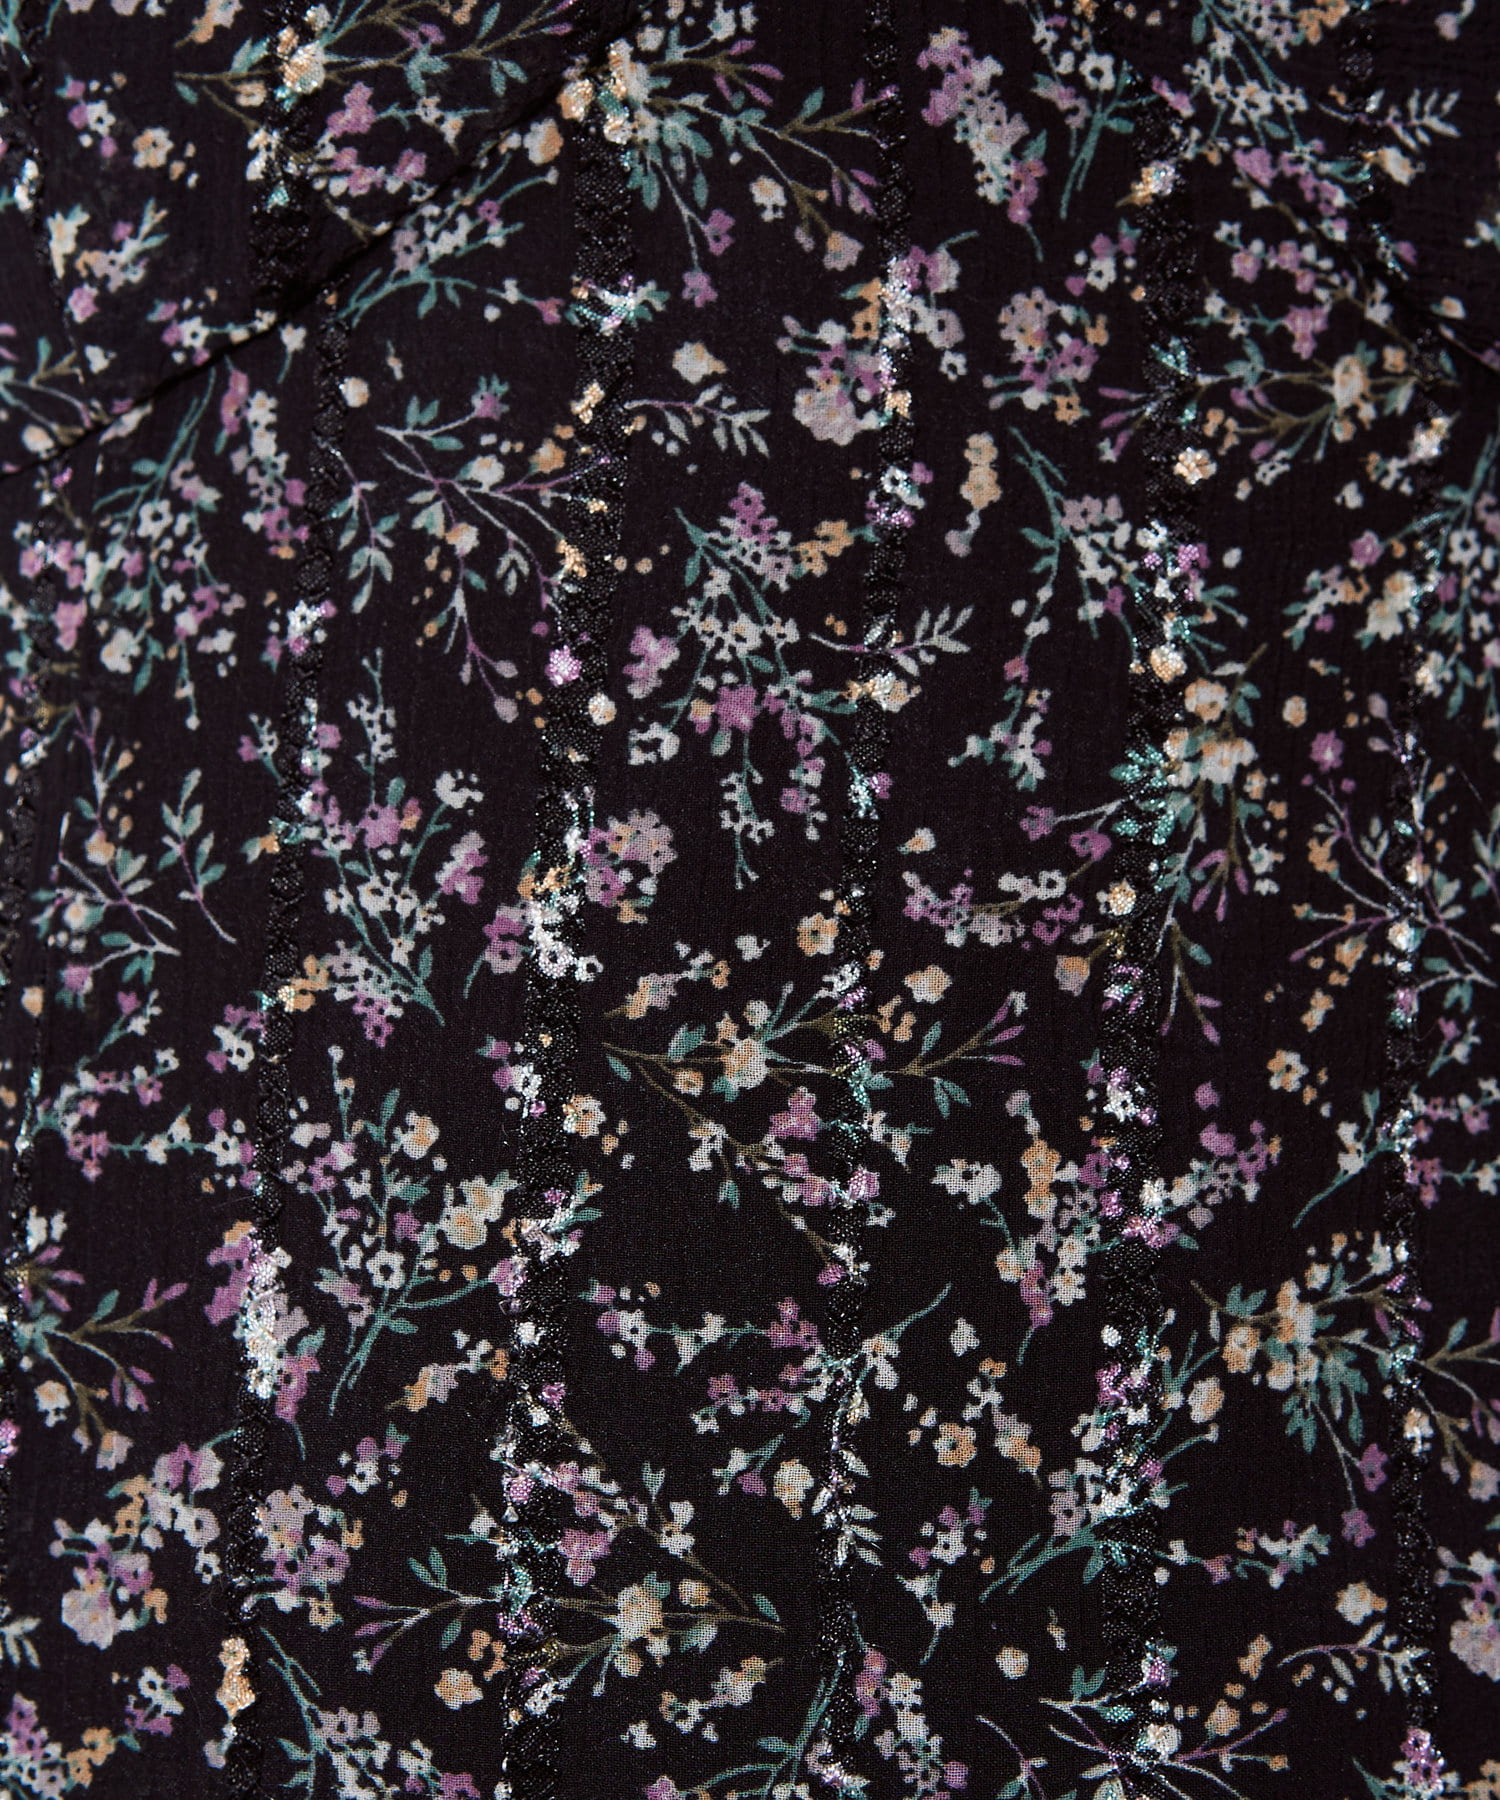 natural couture(ナチュラルクチュール) 【着用動画&解説あり】【WEB限定】ストライプ花柄フリルワンピース